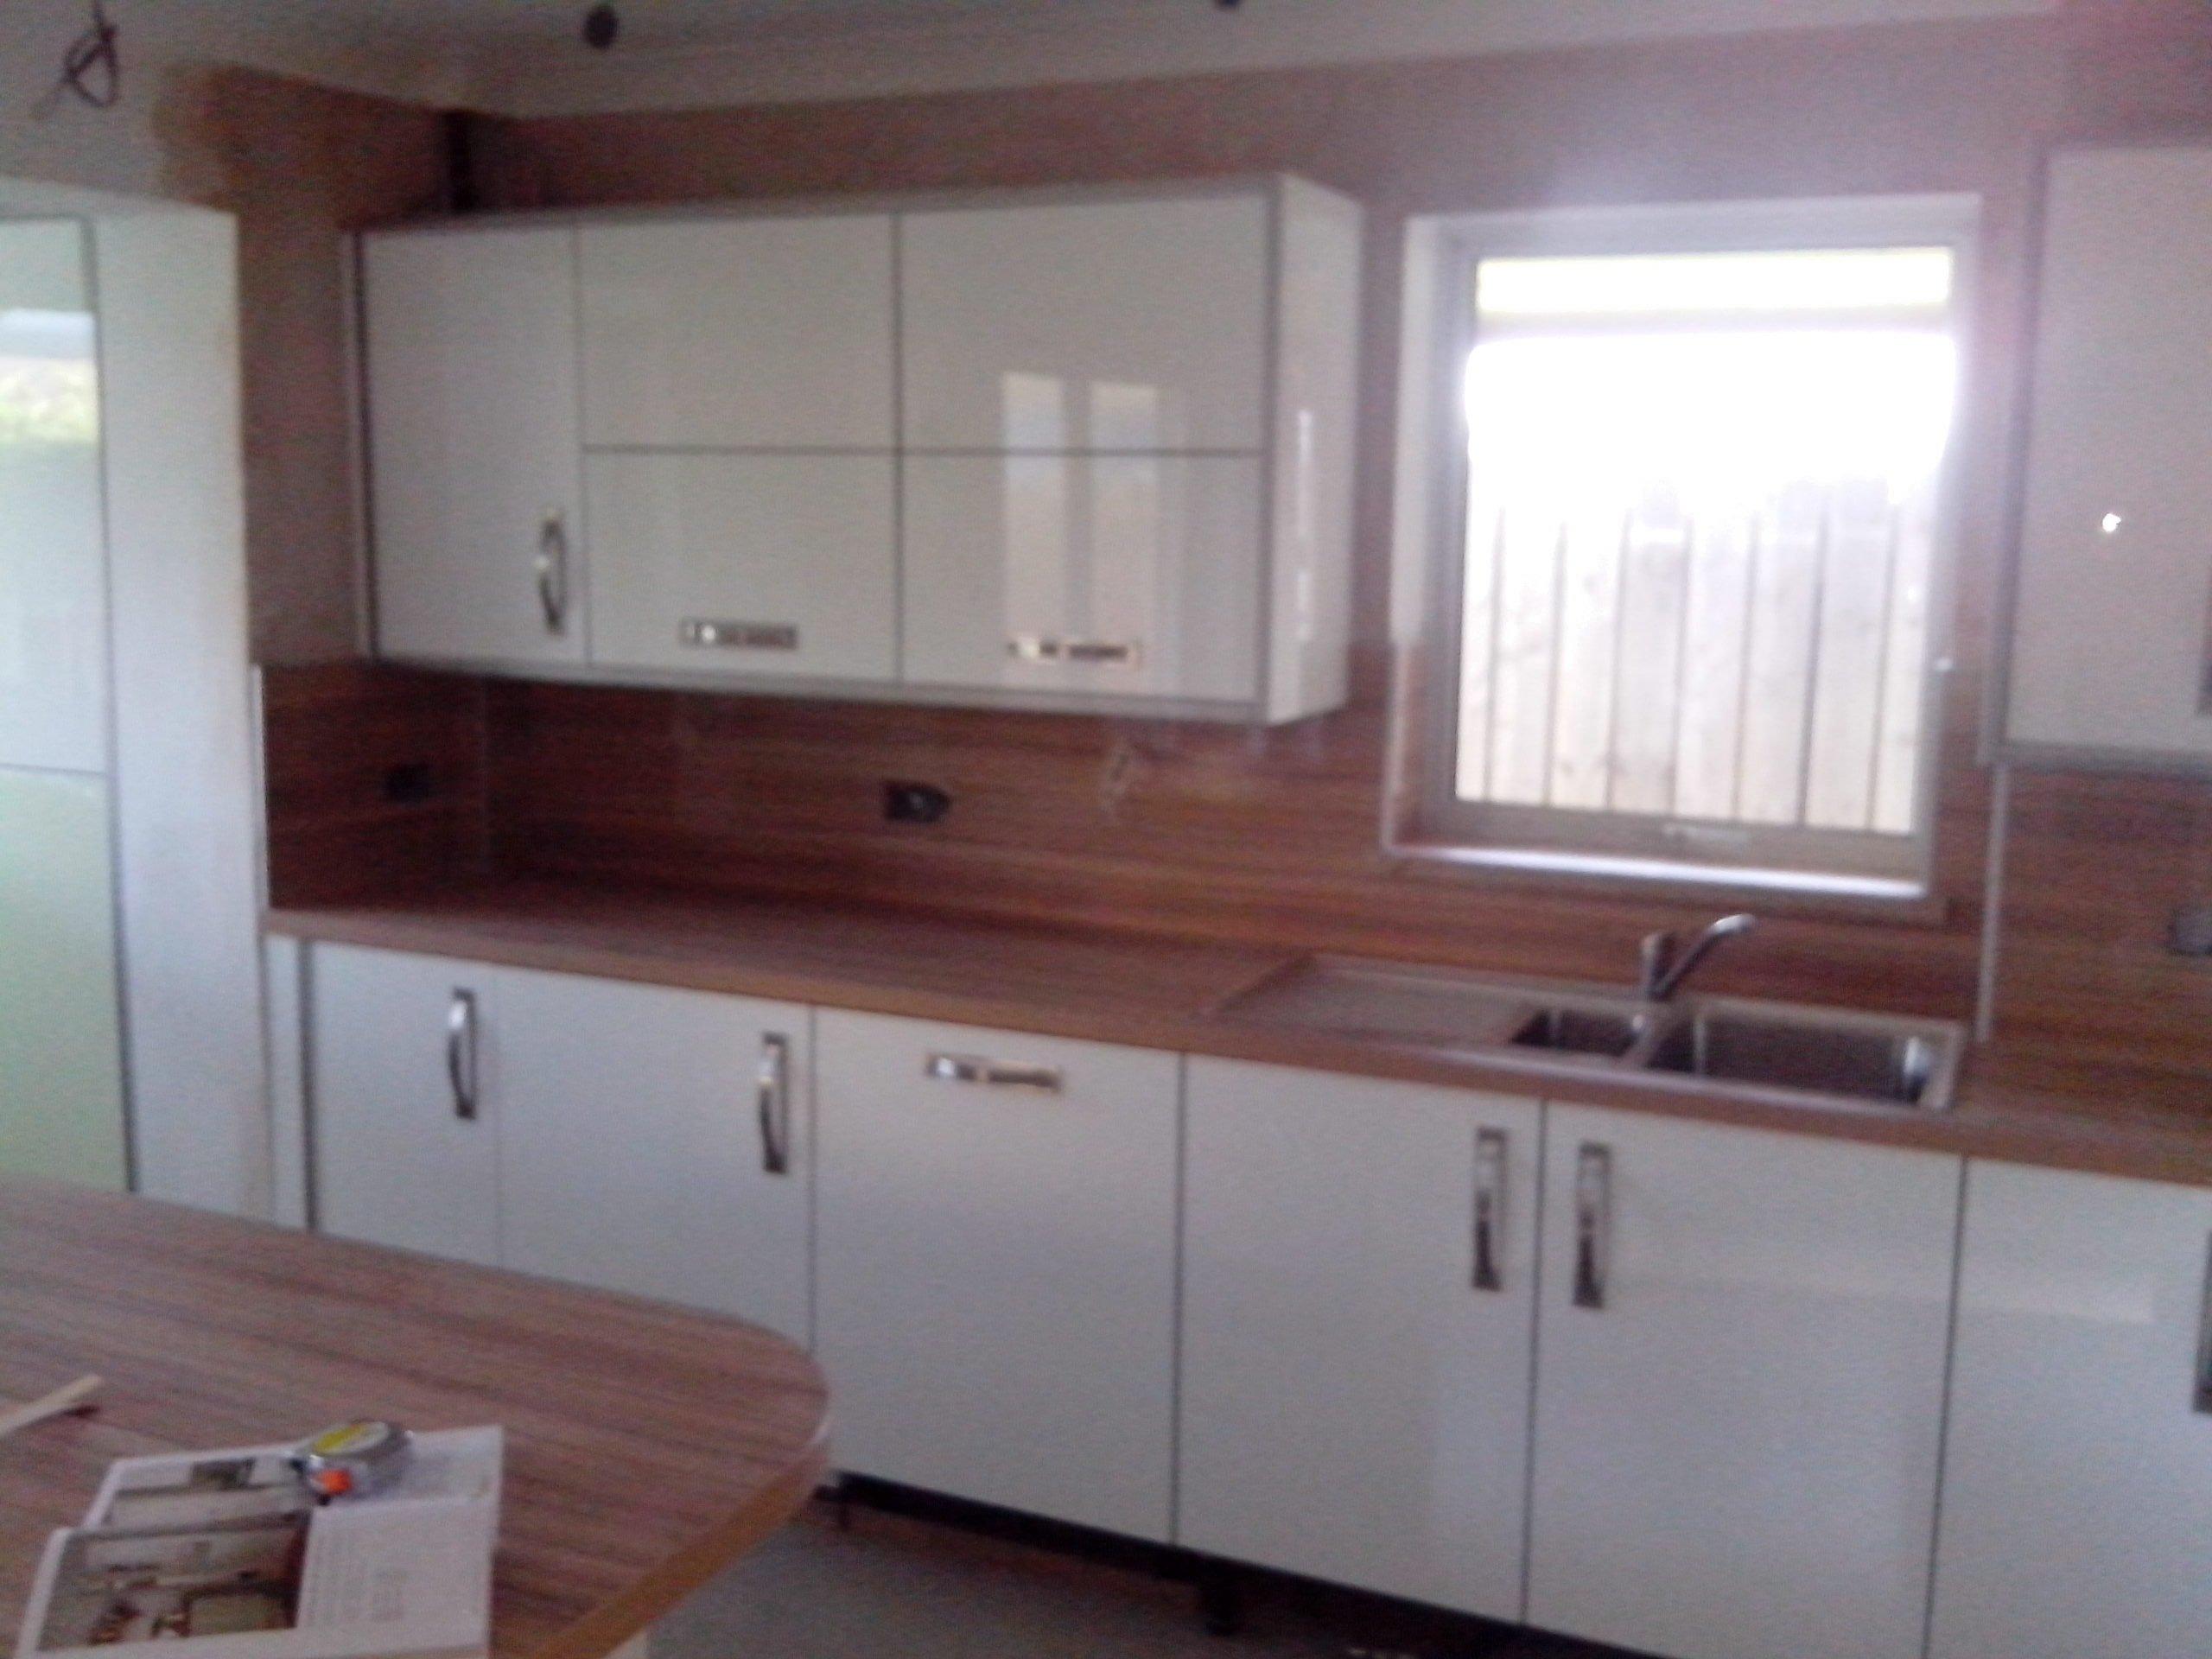 Kitchen refurbishment projects